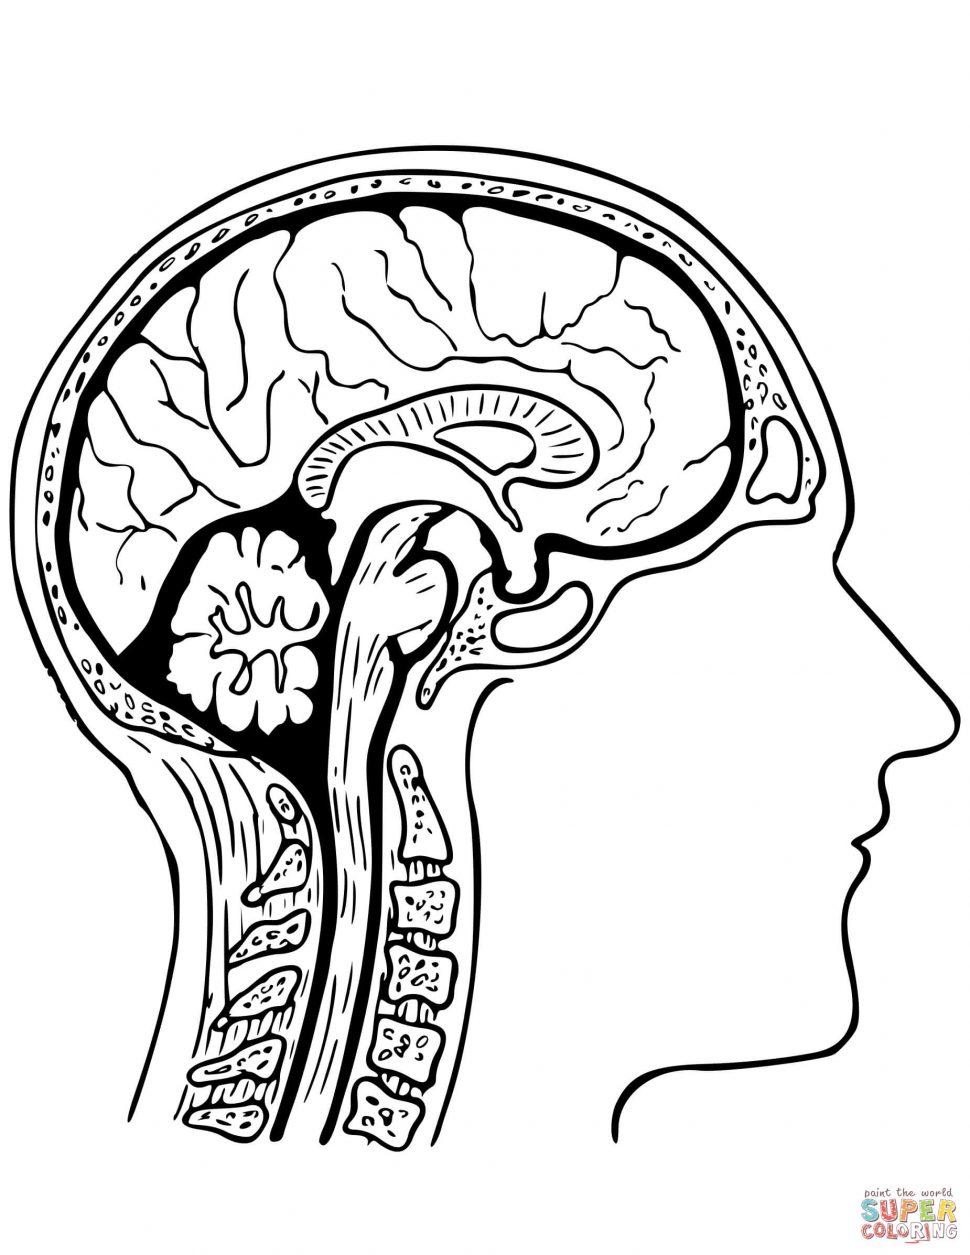 Brain Anatomy Drawing at GetDrawings | Free download